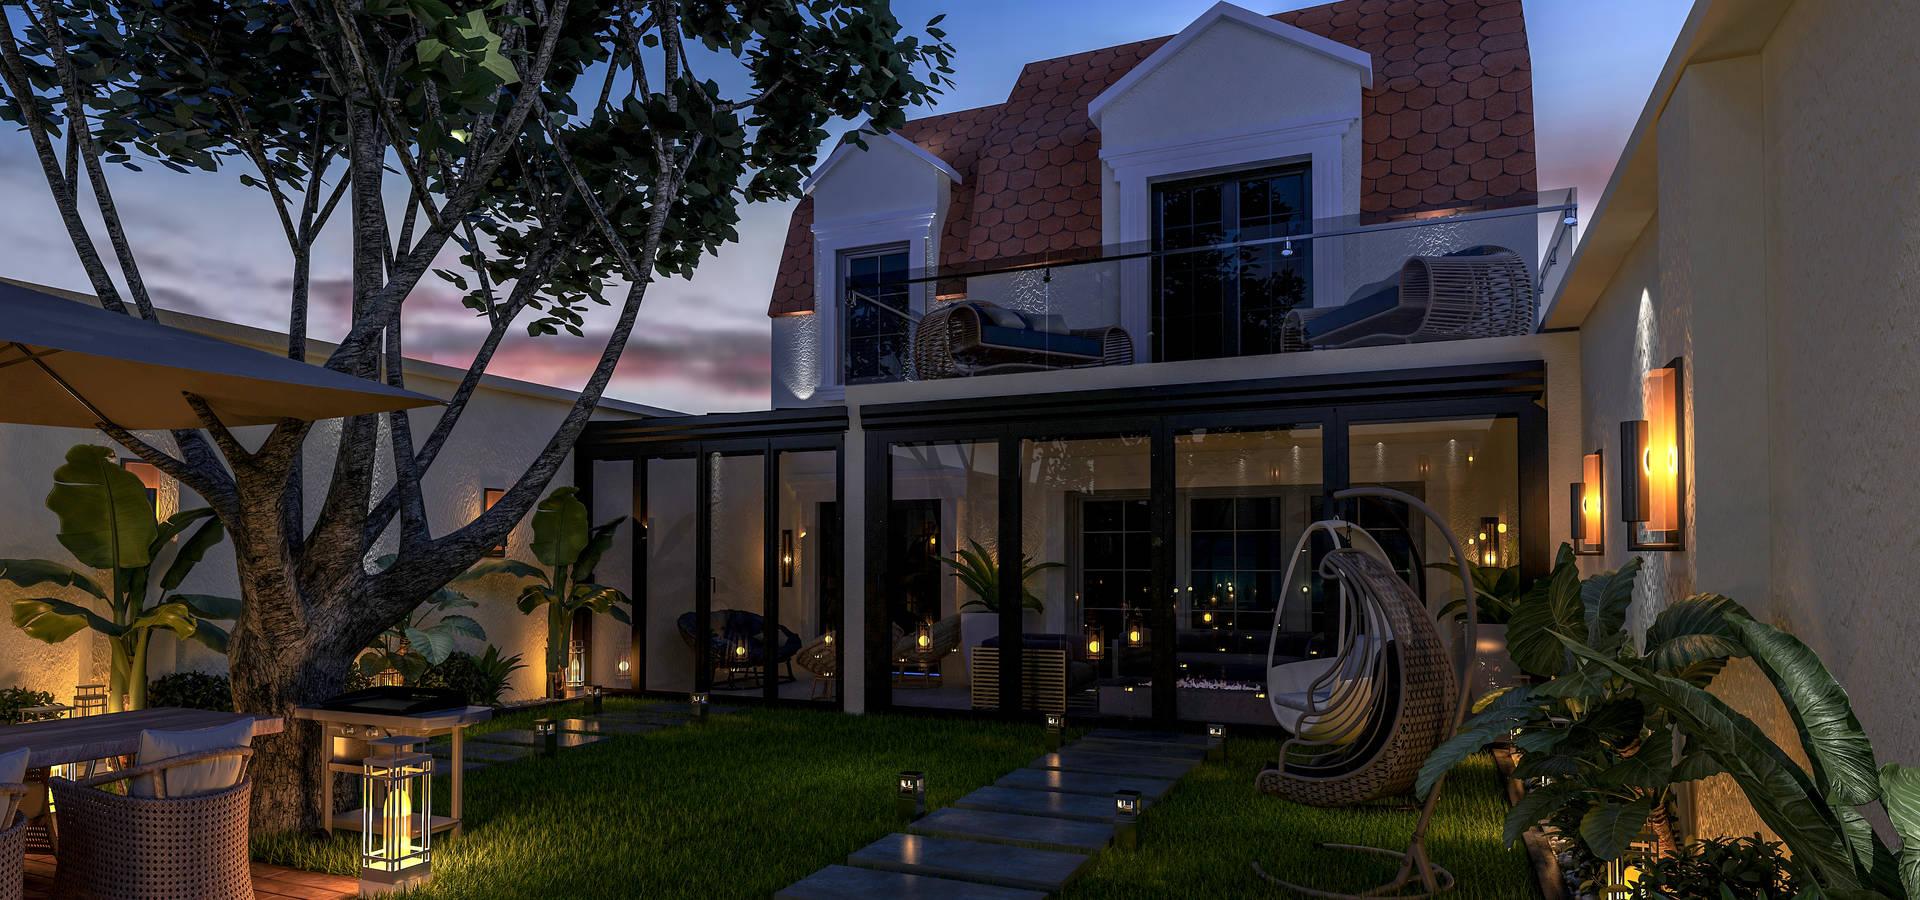 Ali Kafadar Design Studio